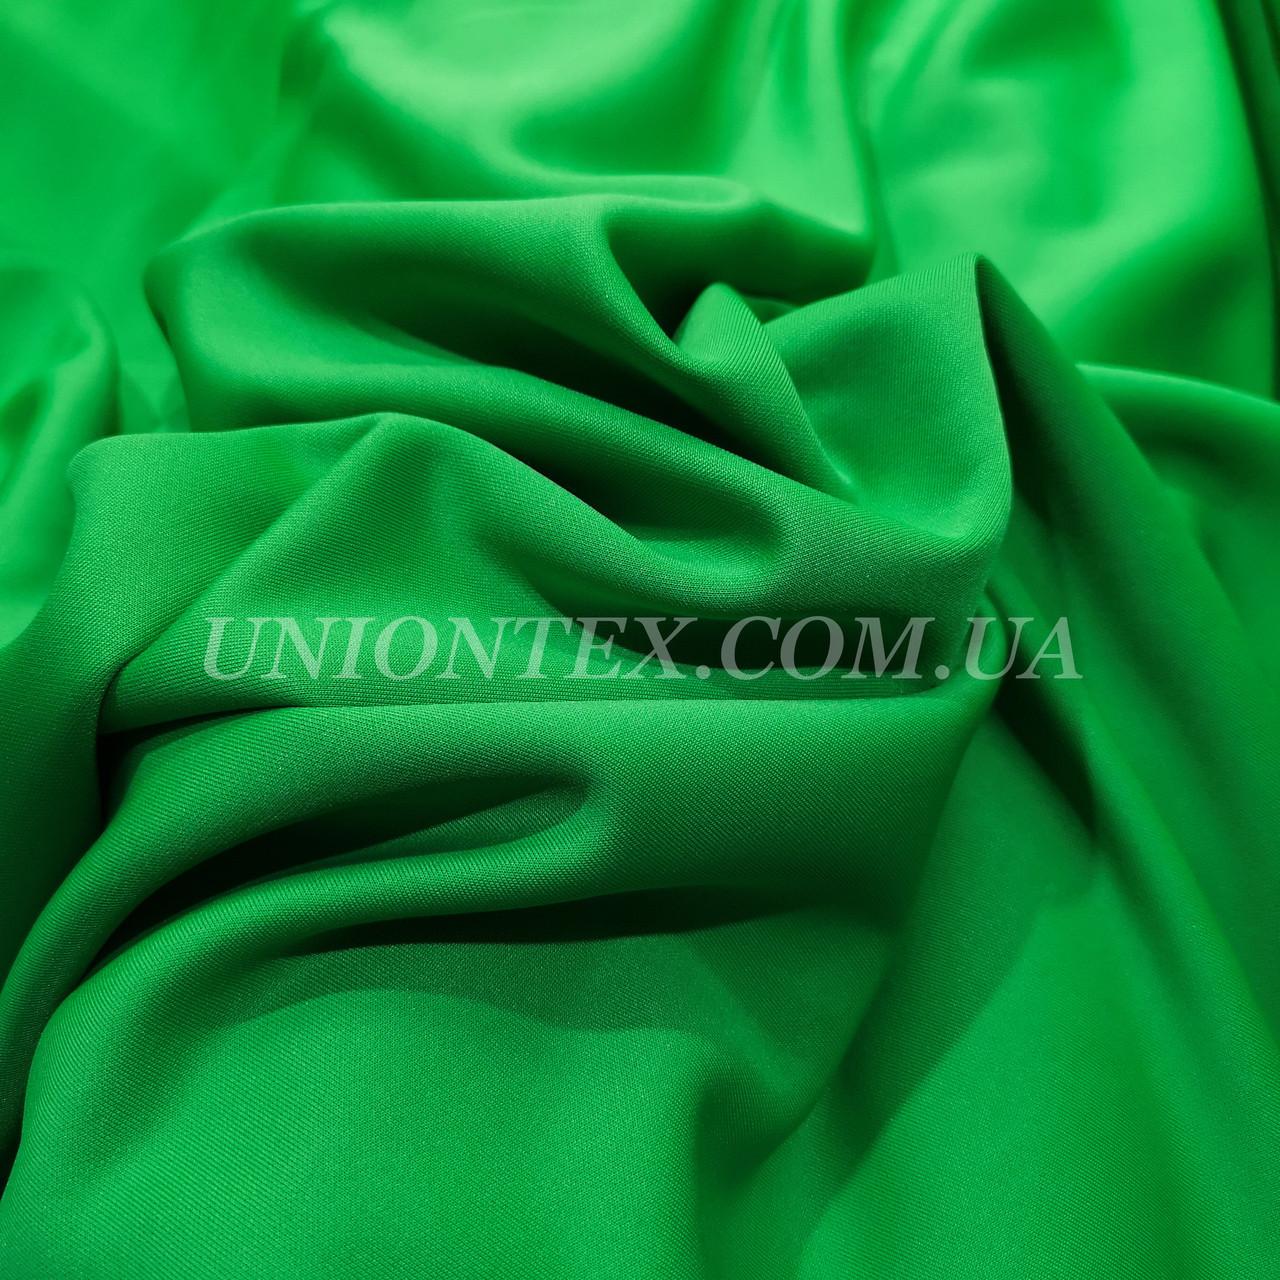 Трикотаж дайвинг зеленый